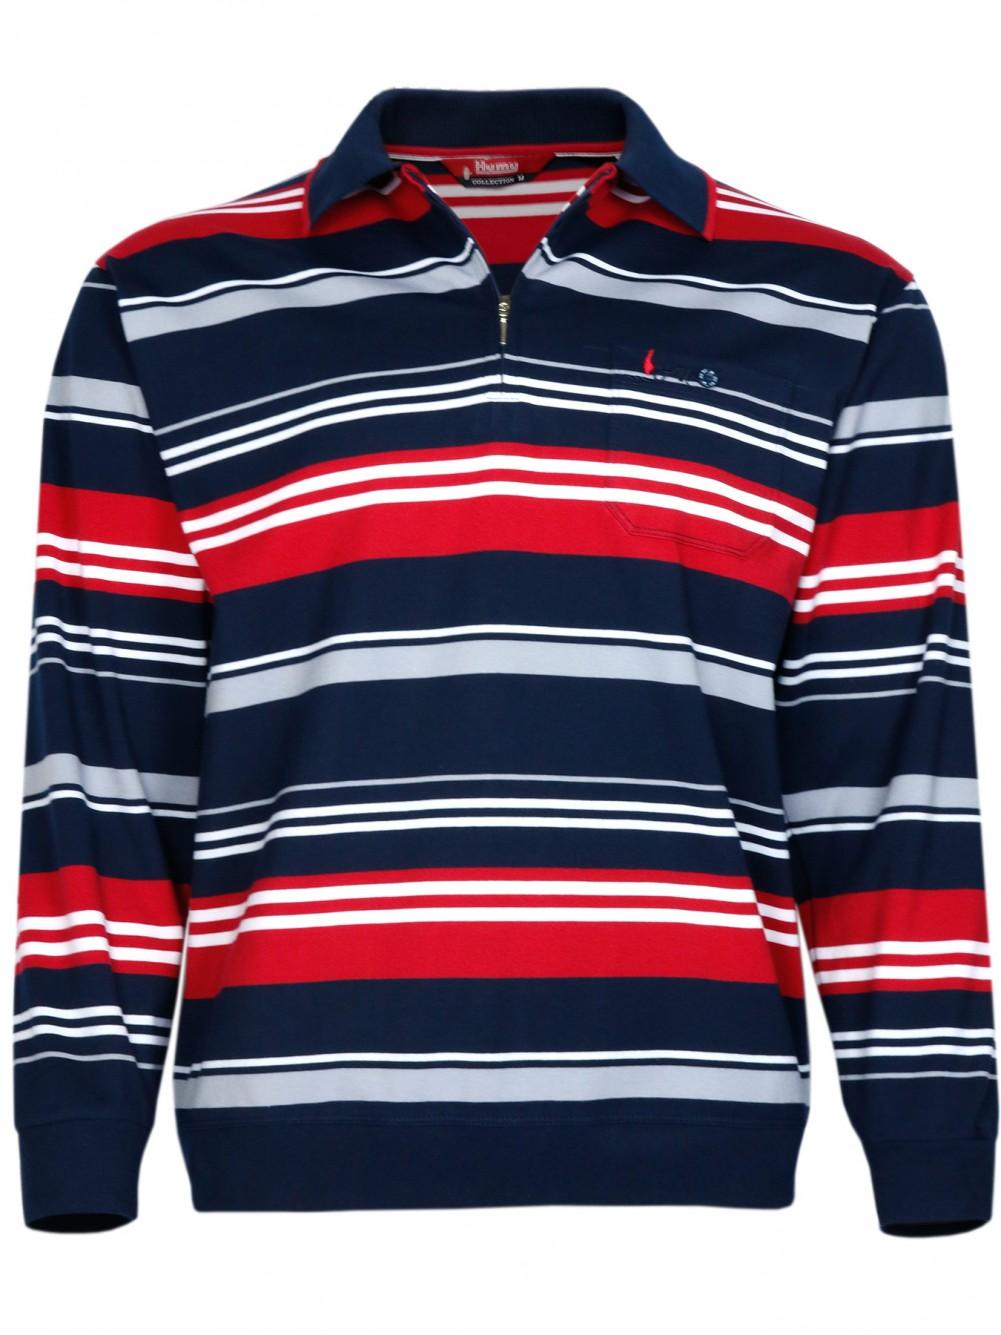 Herren Langarm-Poloshirts aus 100% Baumwolle - Navy